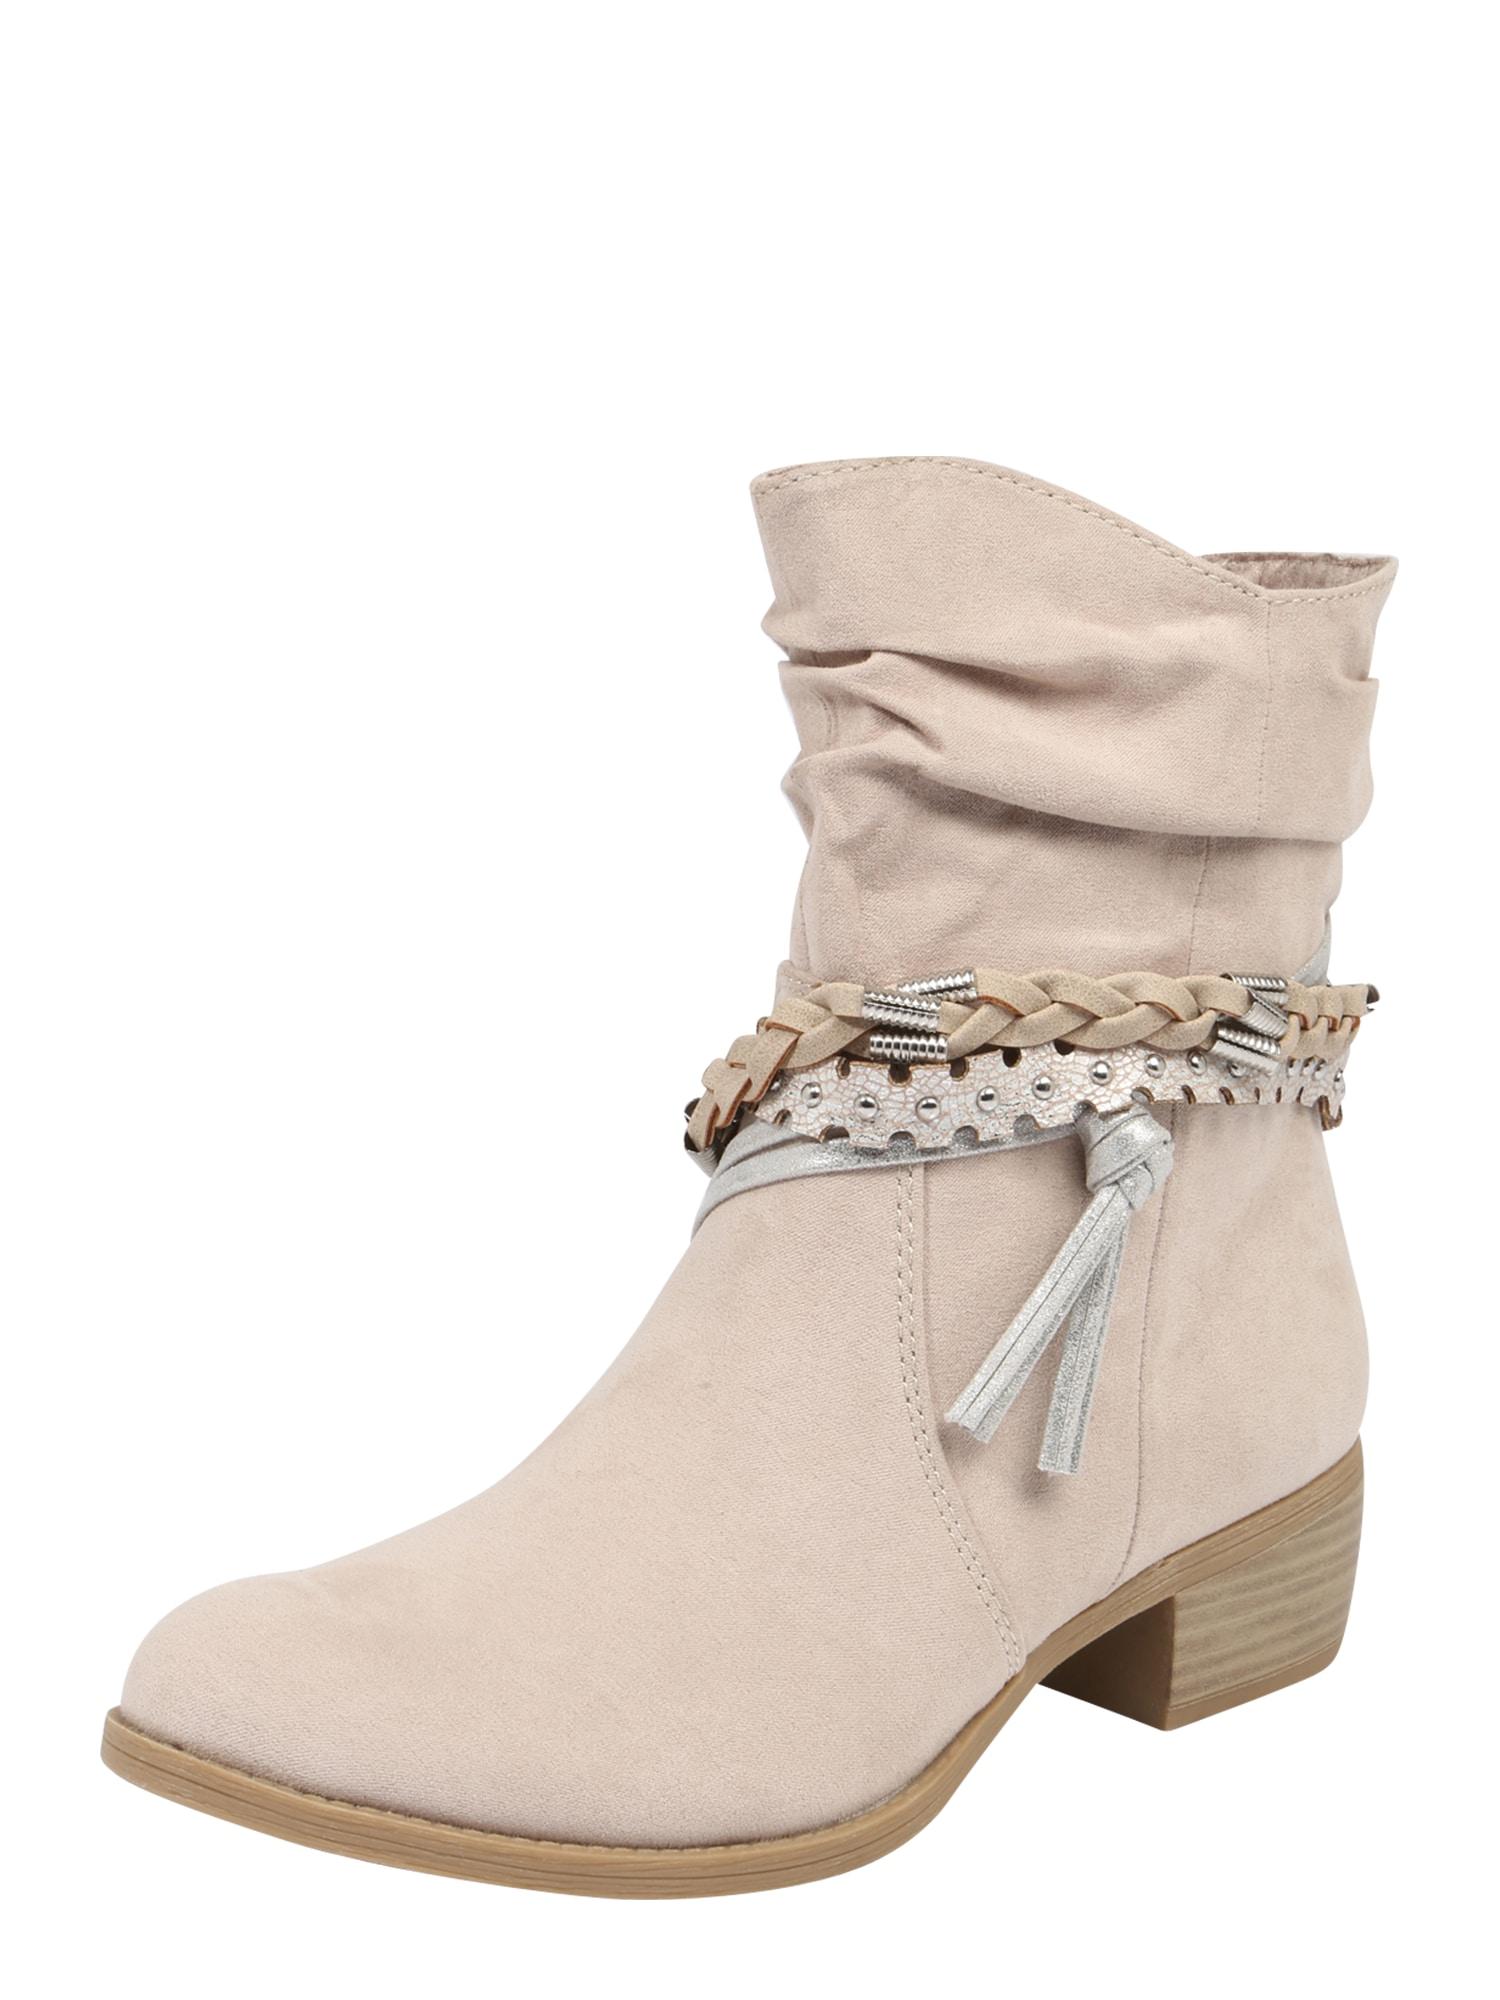 Damenschuhe Rieker Sneaker grau N9110 90 90 | Schuhe24